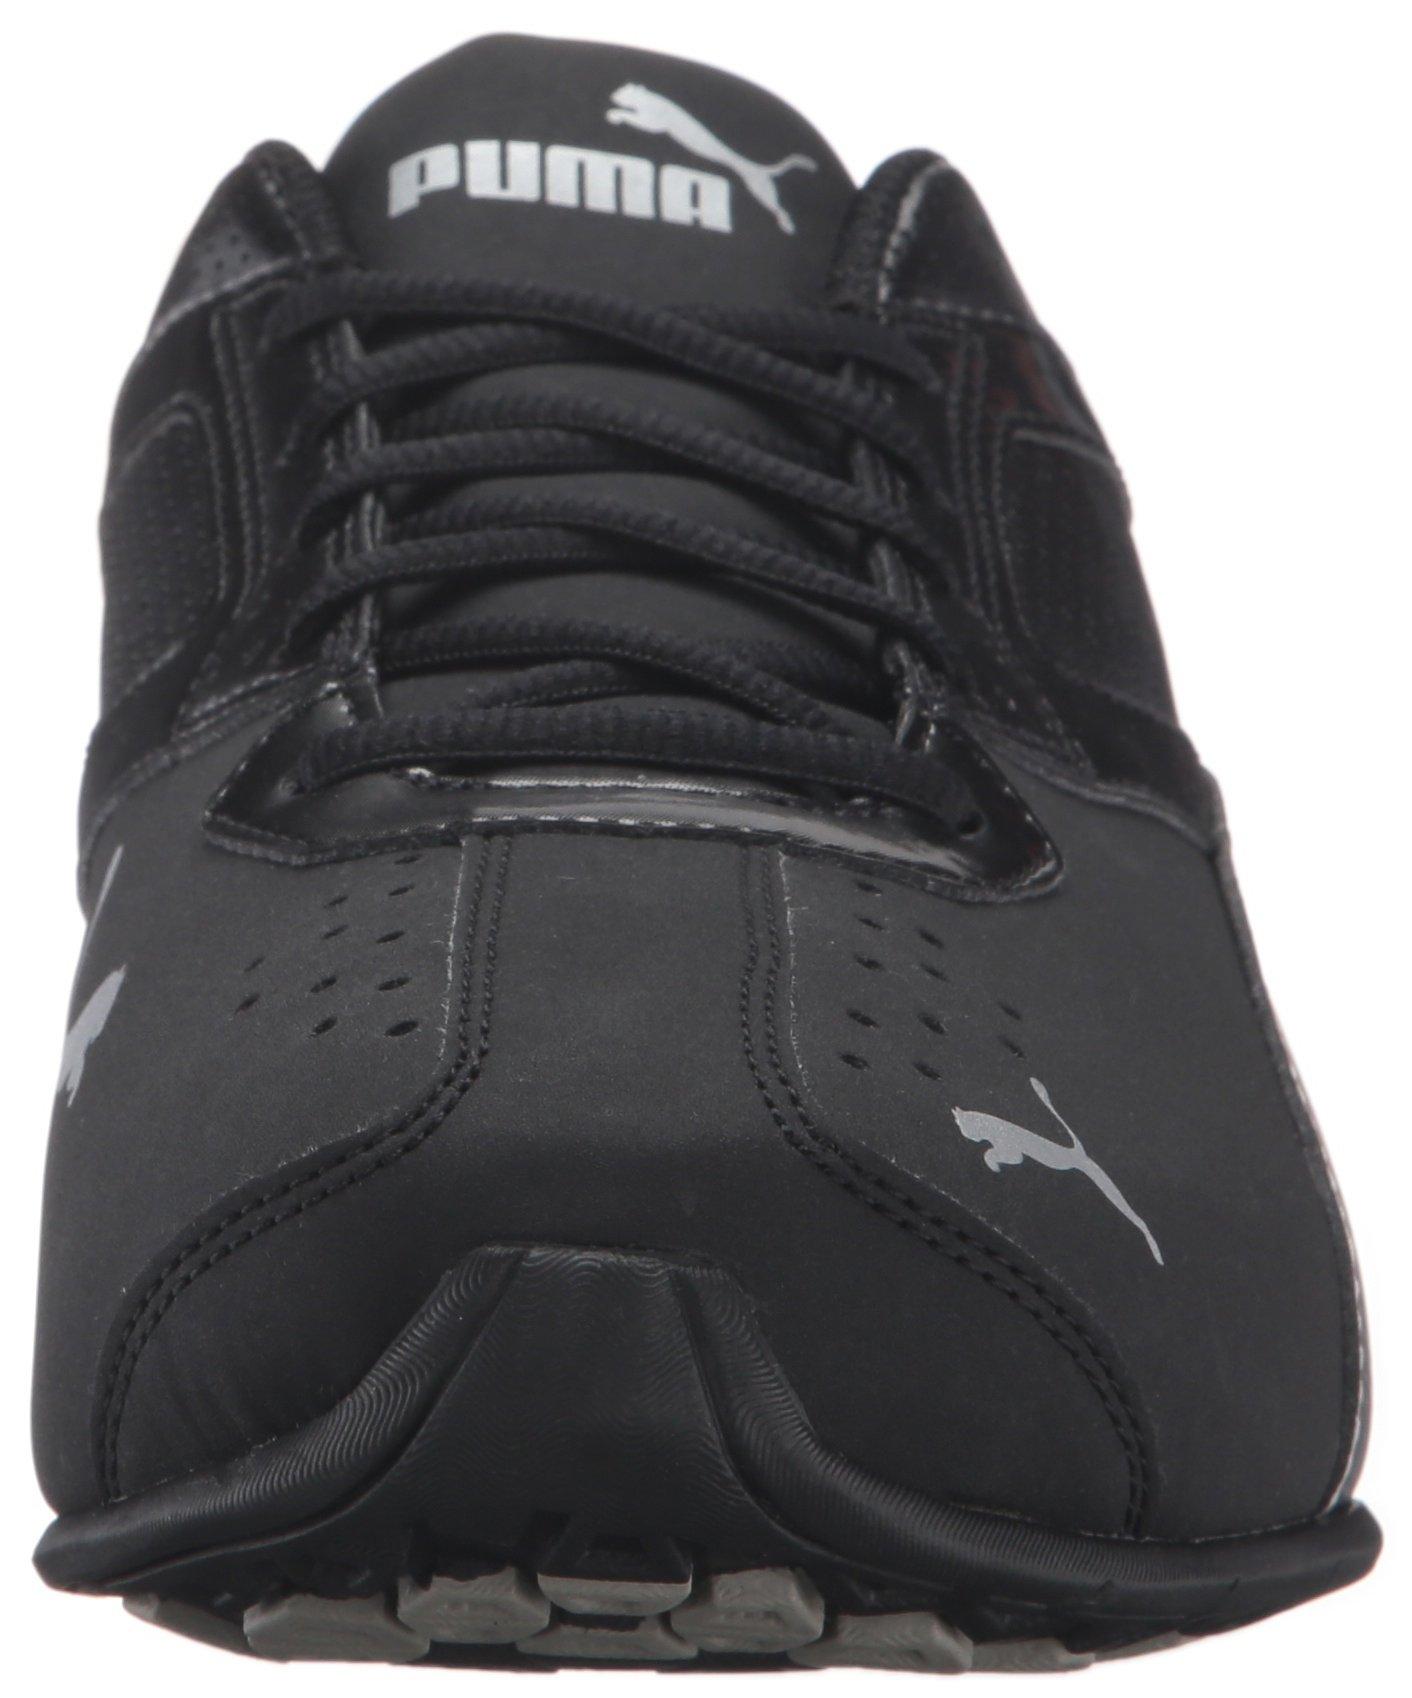 PUMA Men's Tazon 6 FM Puma Black/ Puma Silver Running Shoe - 8 D(M) US by PUMA (Image #4)